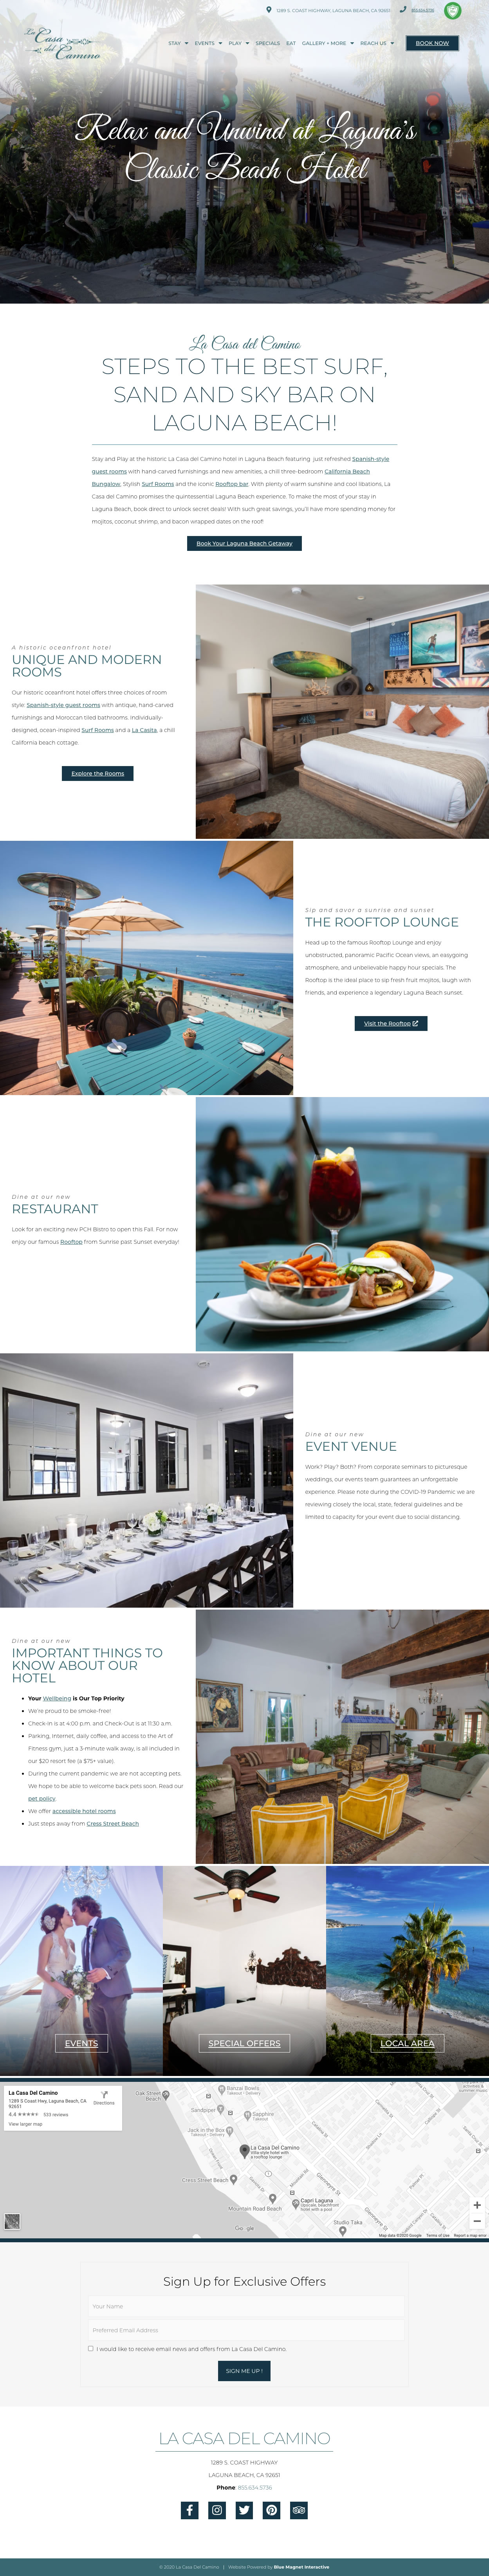 web design example casa del camino